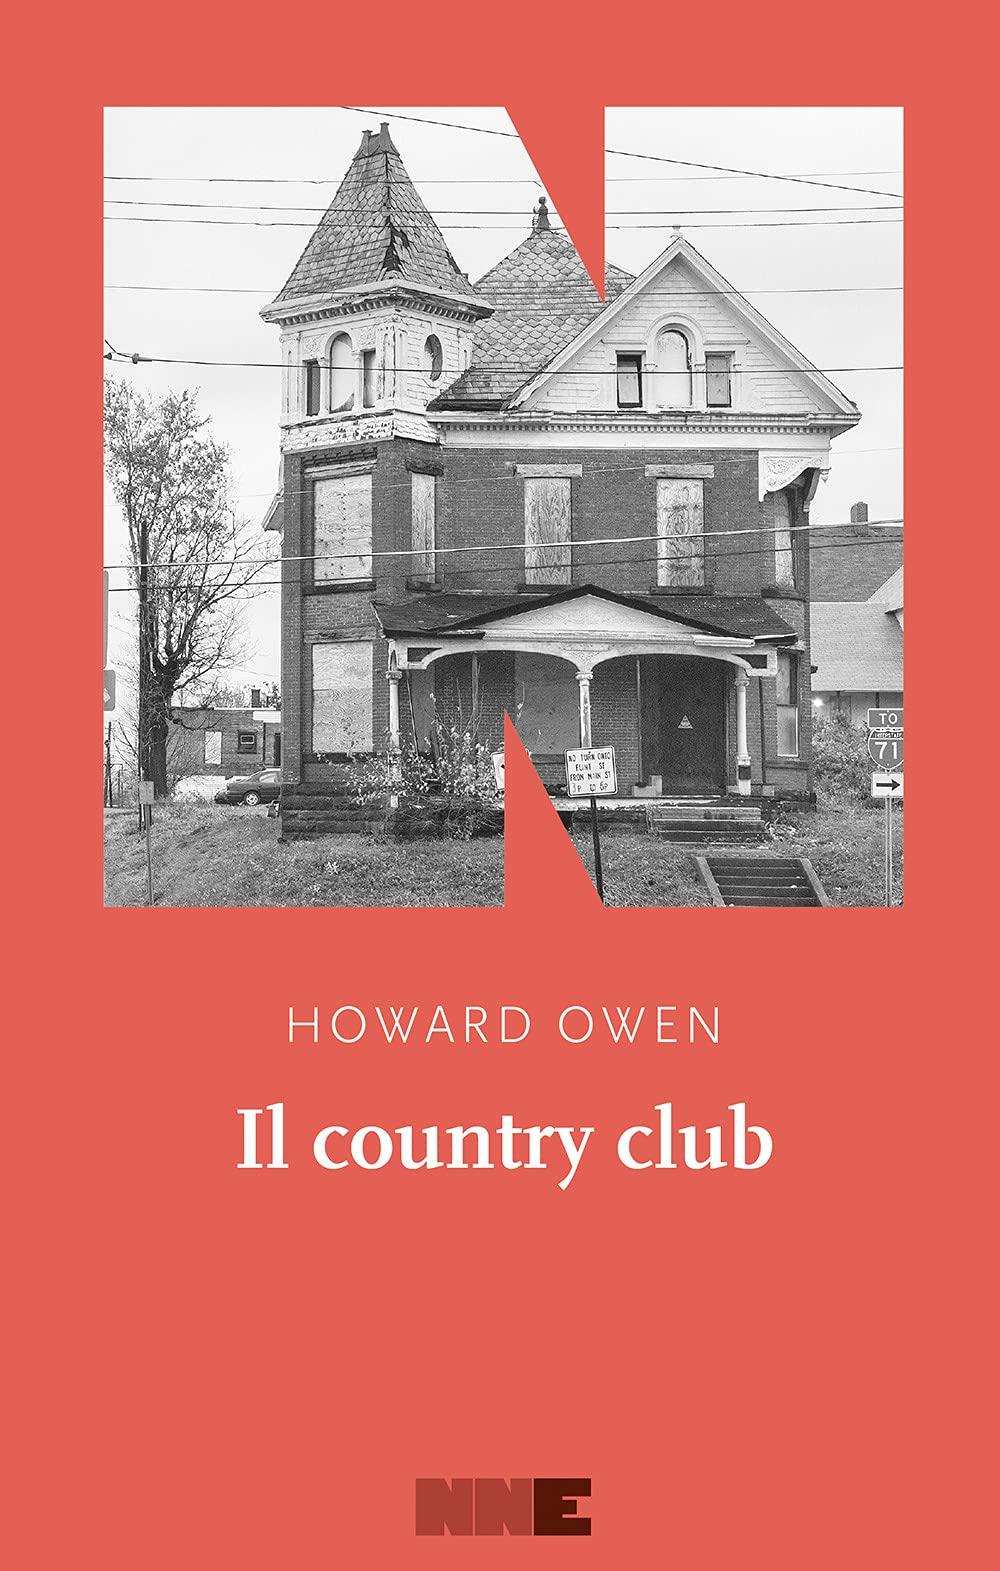 Il country club